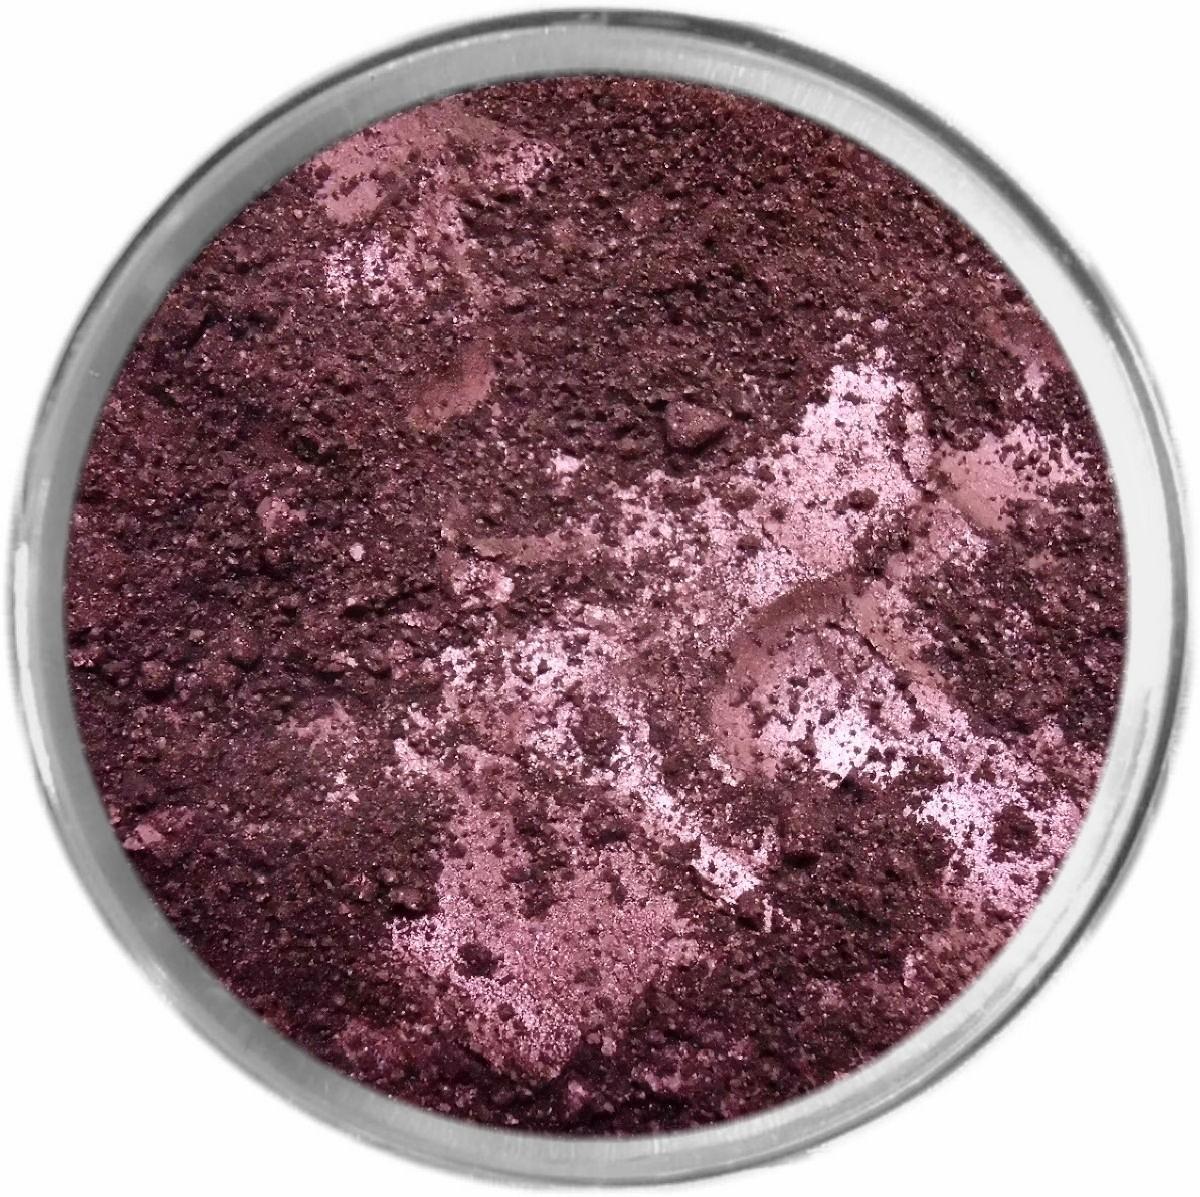 BLACK CHERRY loose powder mineral multi-use color makeup bare earth pigment minerals